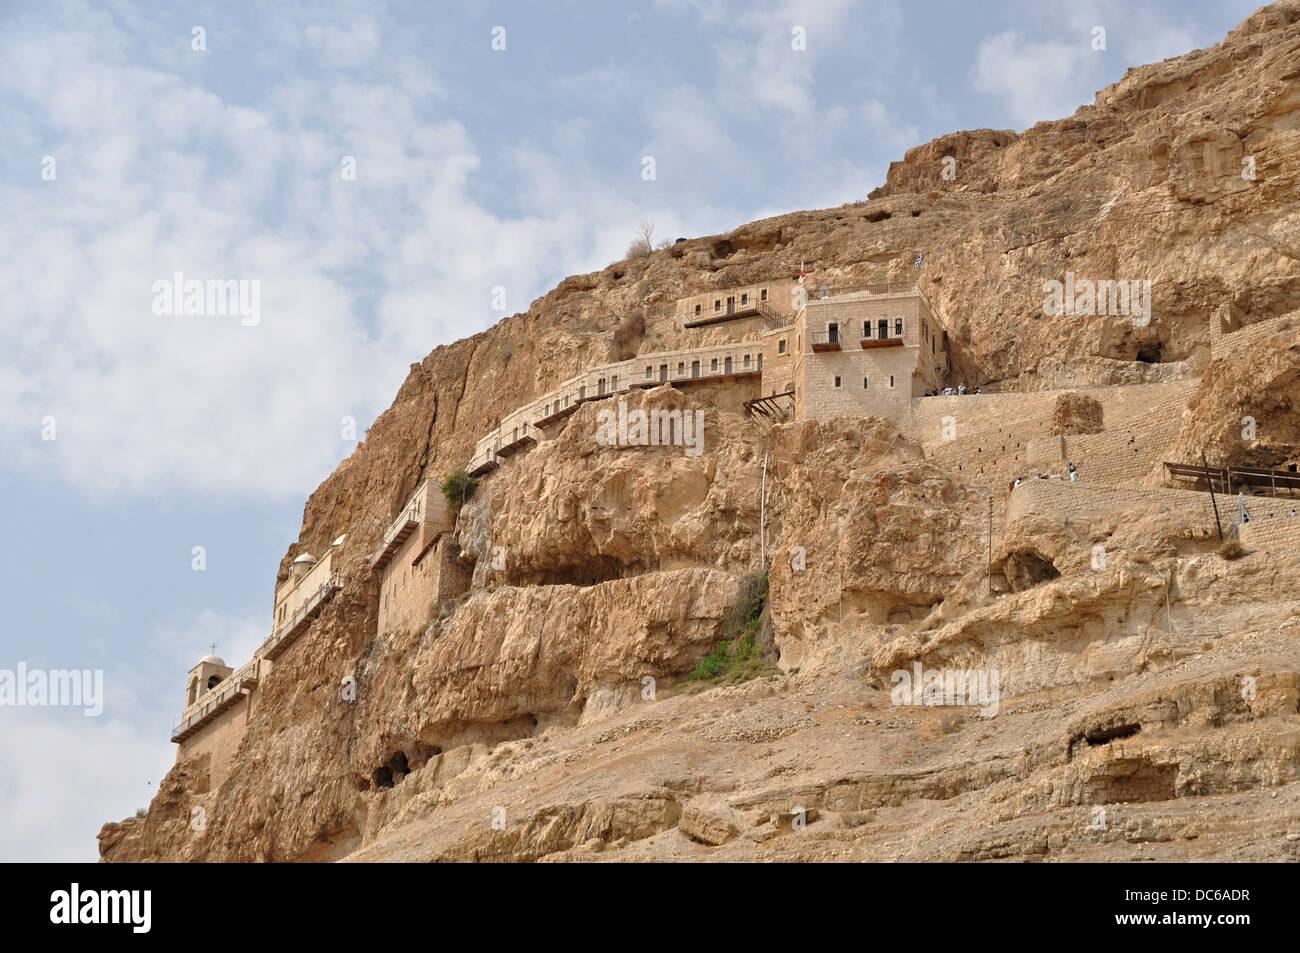 Jericho-Palestine - Stock Image